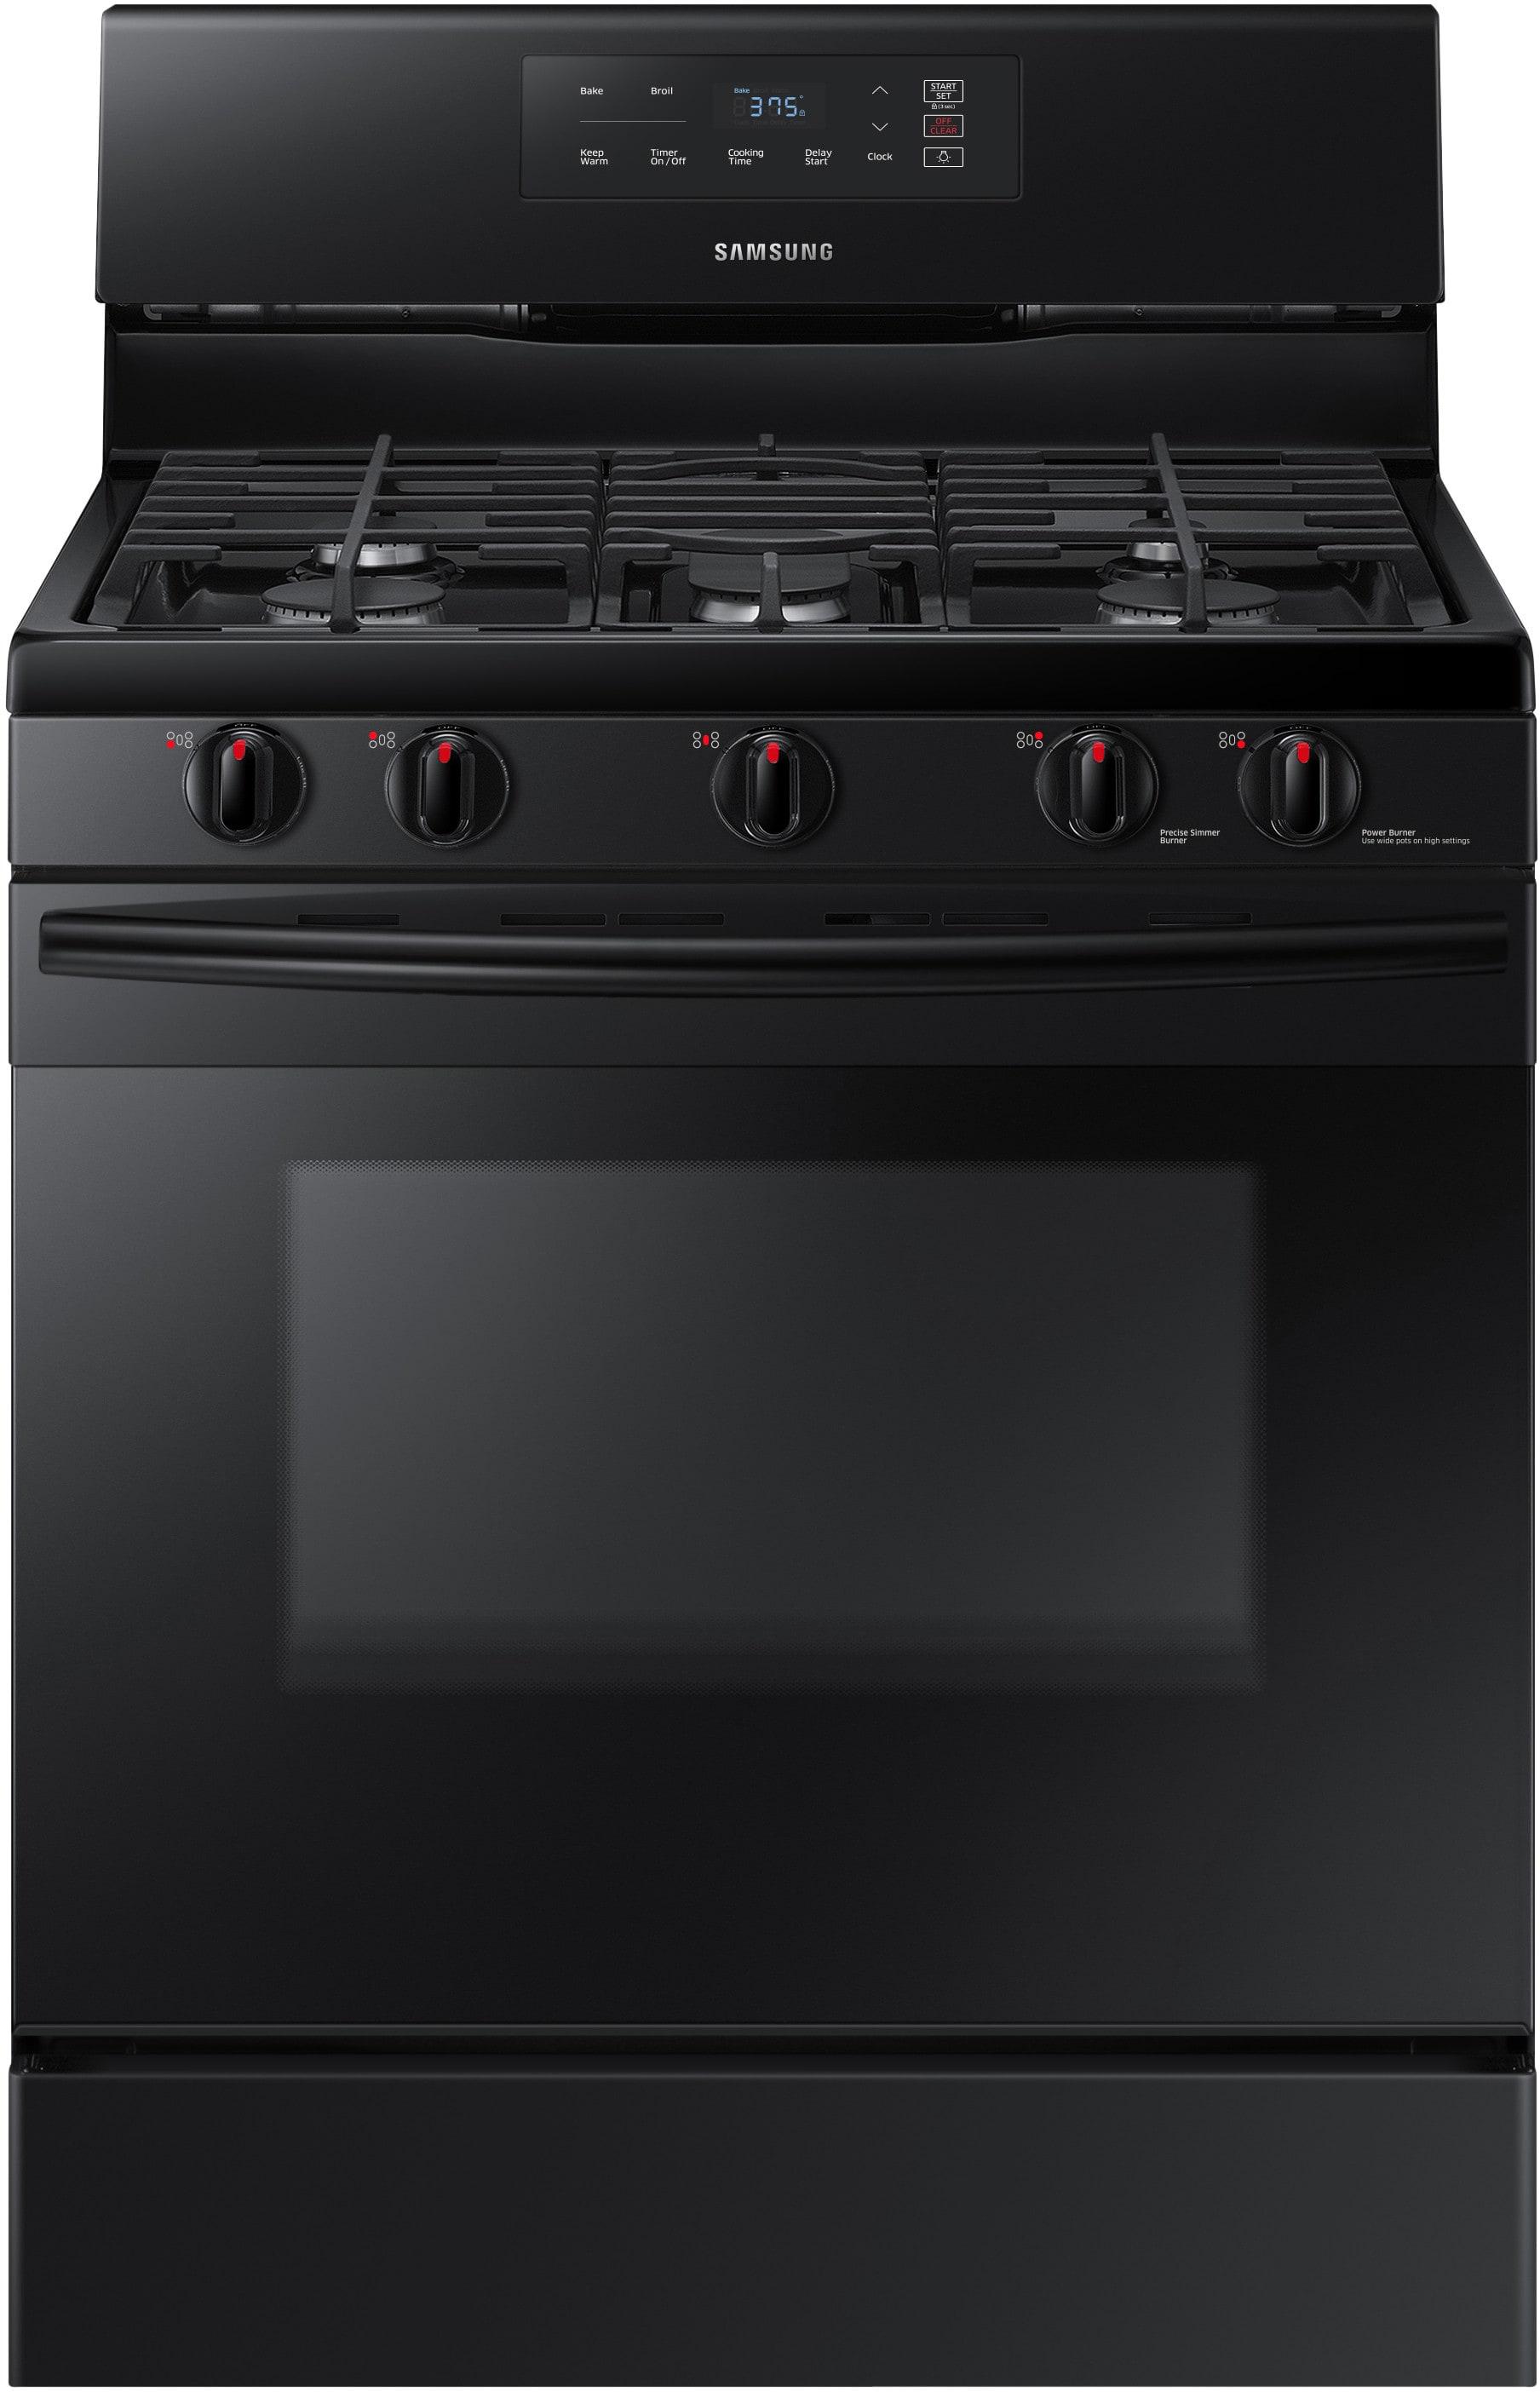 samsung nx58k3310sb 30 inch gas range with 5 sealed burners 5 8 conventional oven 2 racks. Black Bedroom Furniture Sets. Home Design Ideas